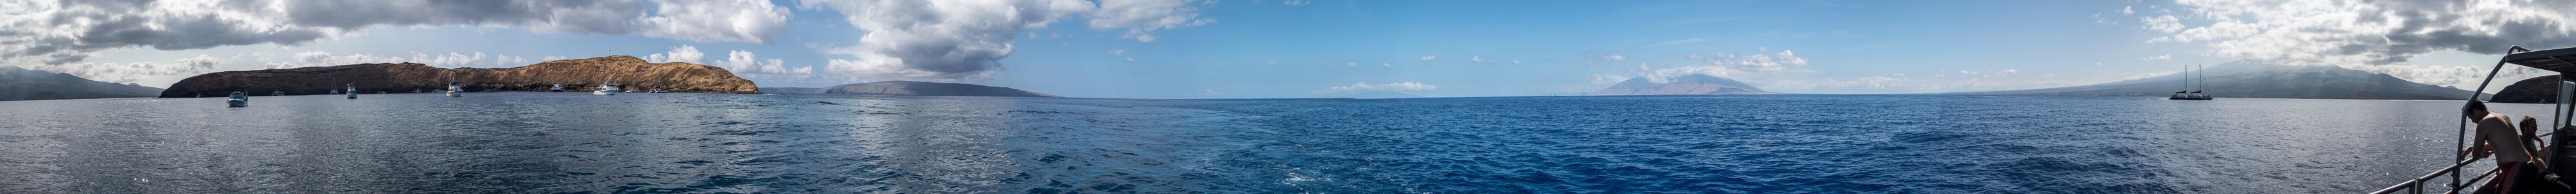 Pazifik. V.l.: Maui, Molokini Crater, Kahoolawe, Lanai, Maui mit den West Maui Mountains und dem Haleakala